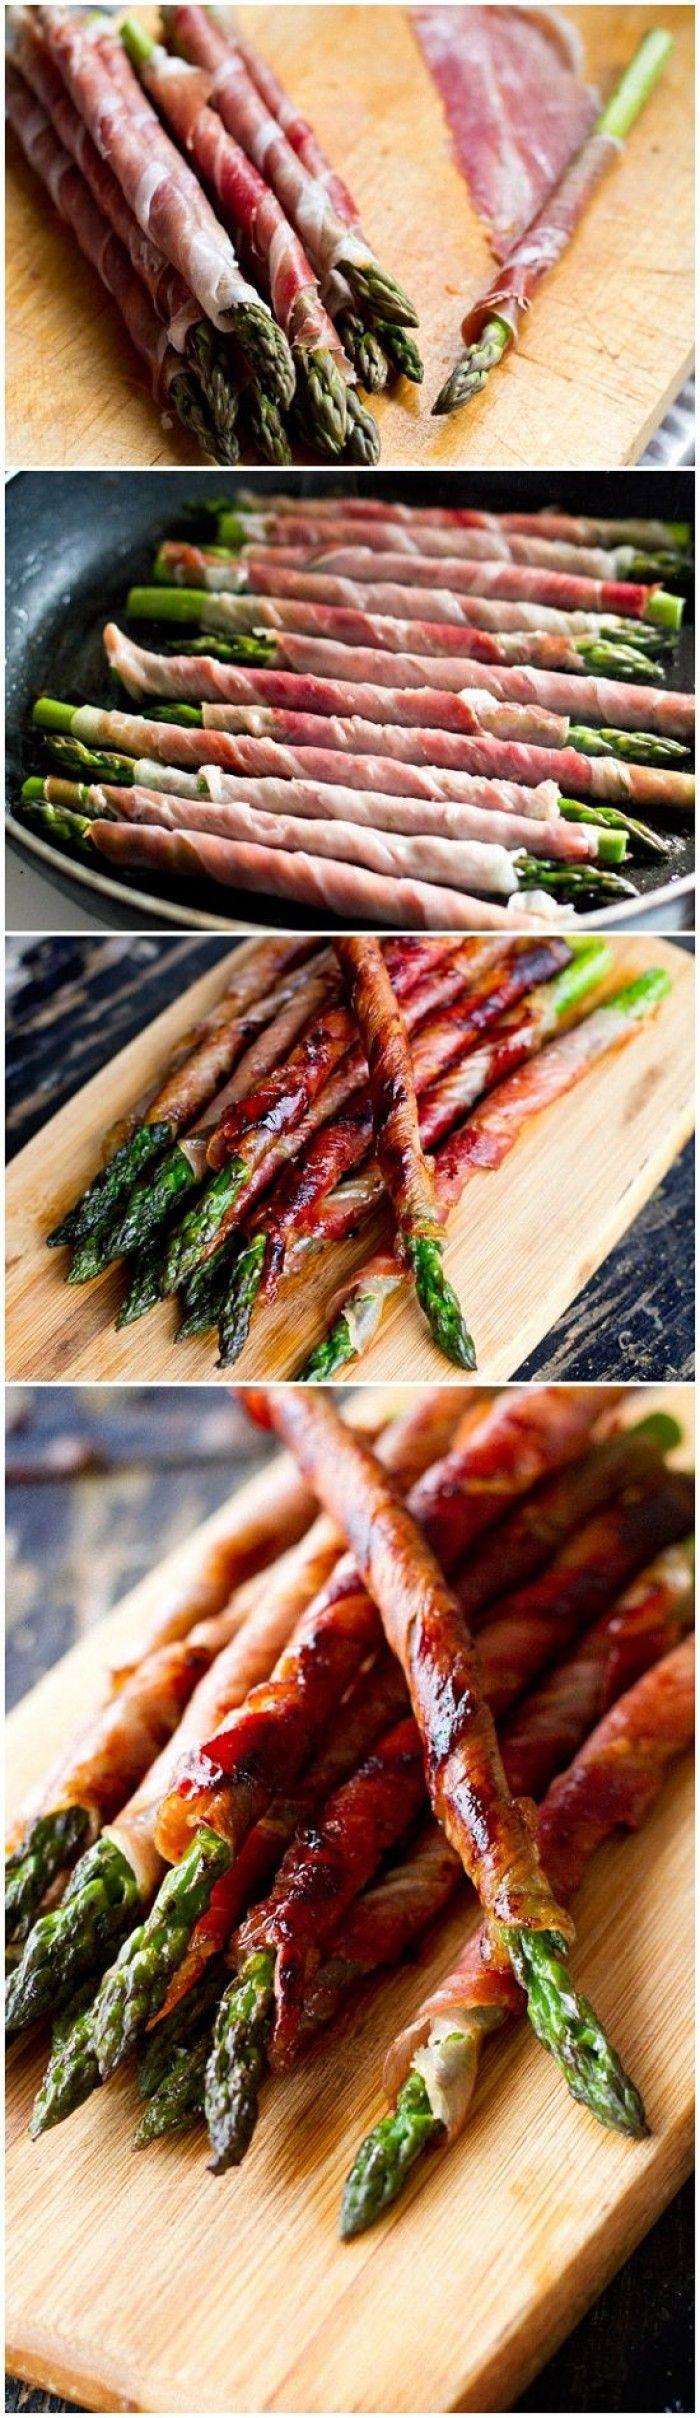 groene asperge met bacon